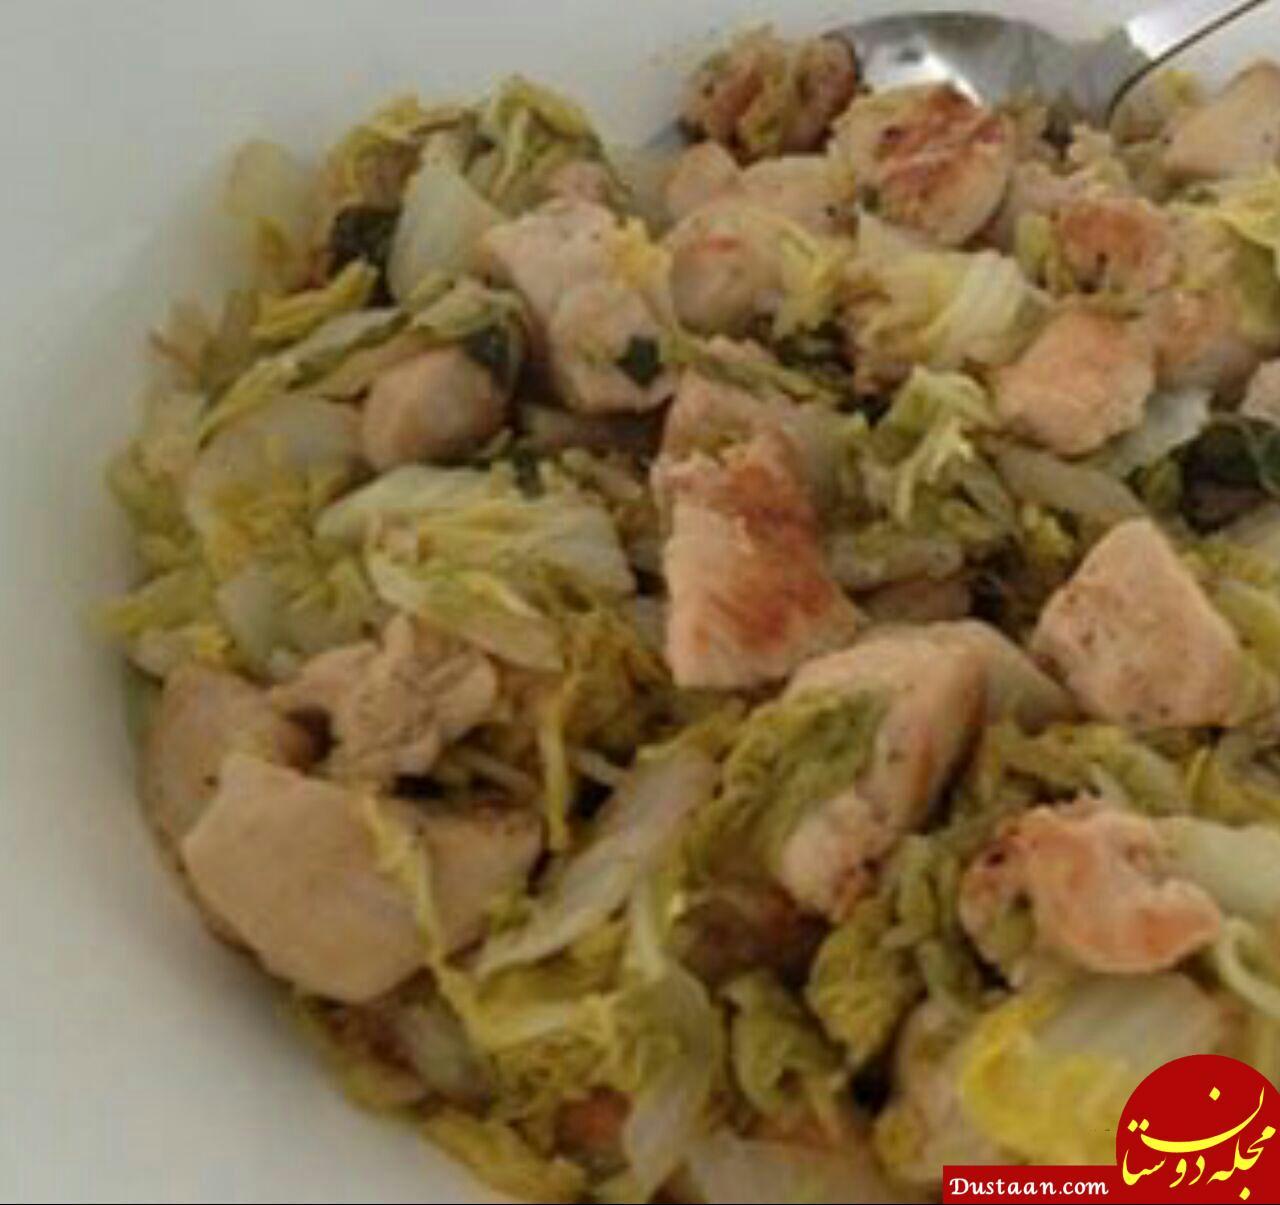 www.dustaan.com طرز تهیه یک شام خوشمزه در عرض 30 دقیقه با مرغ و کاهو!